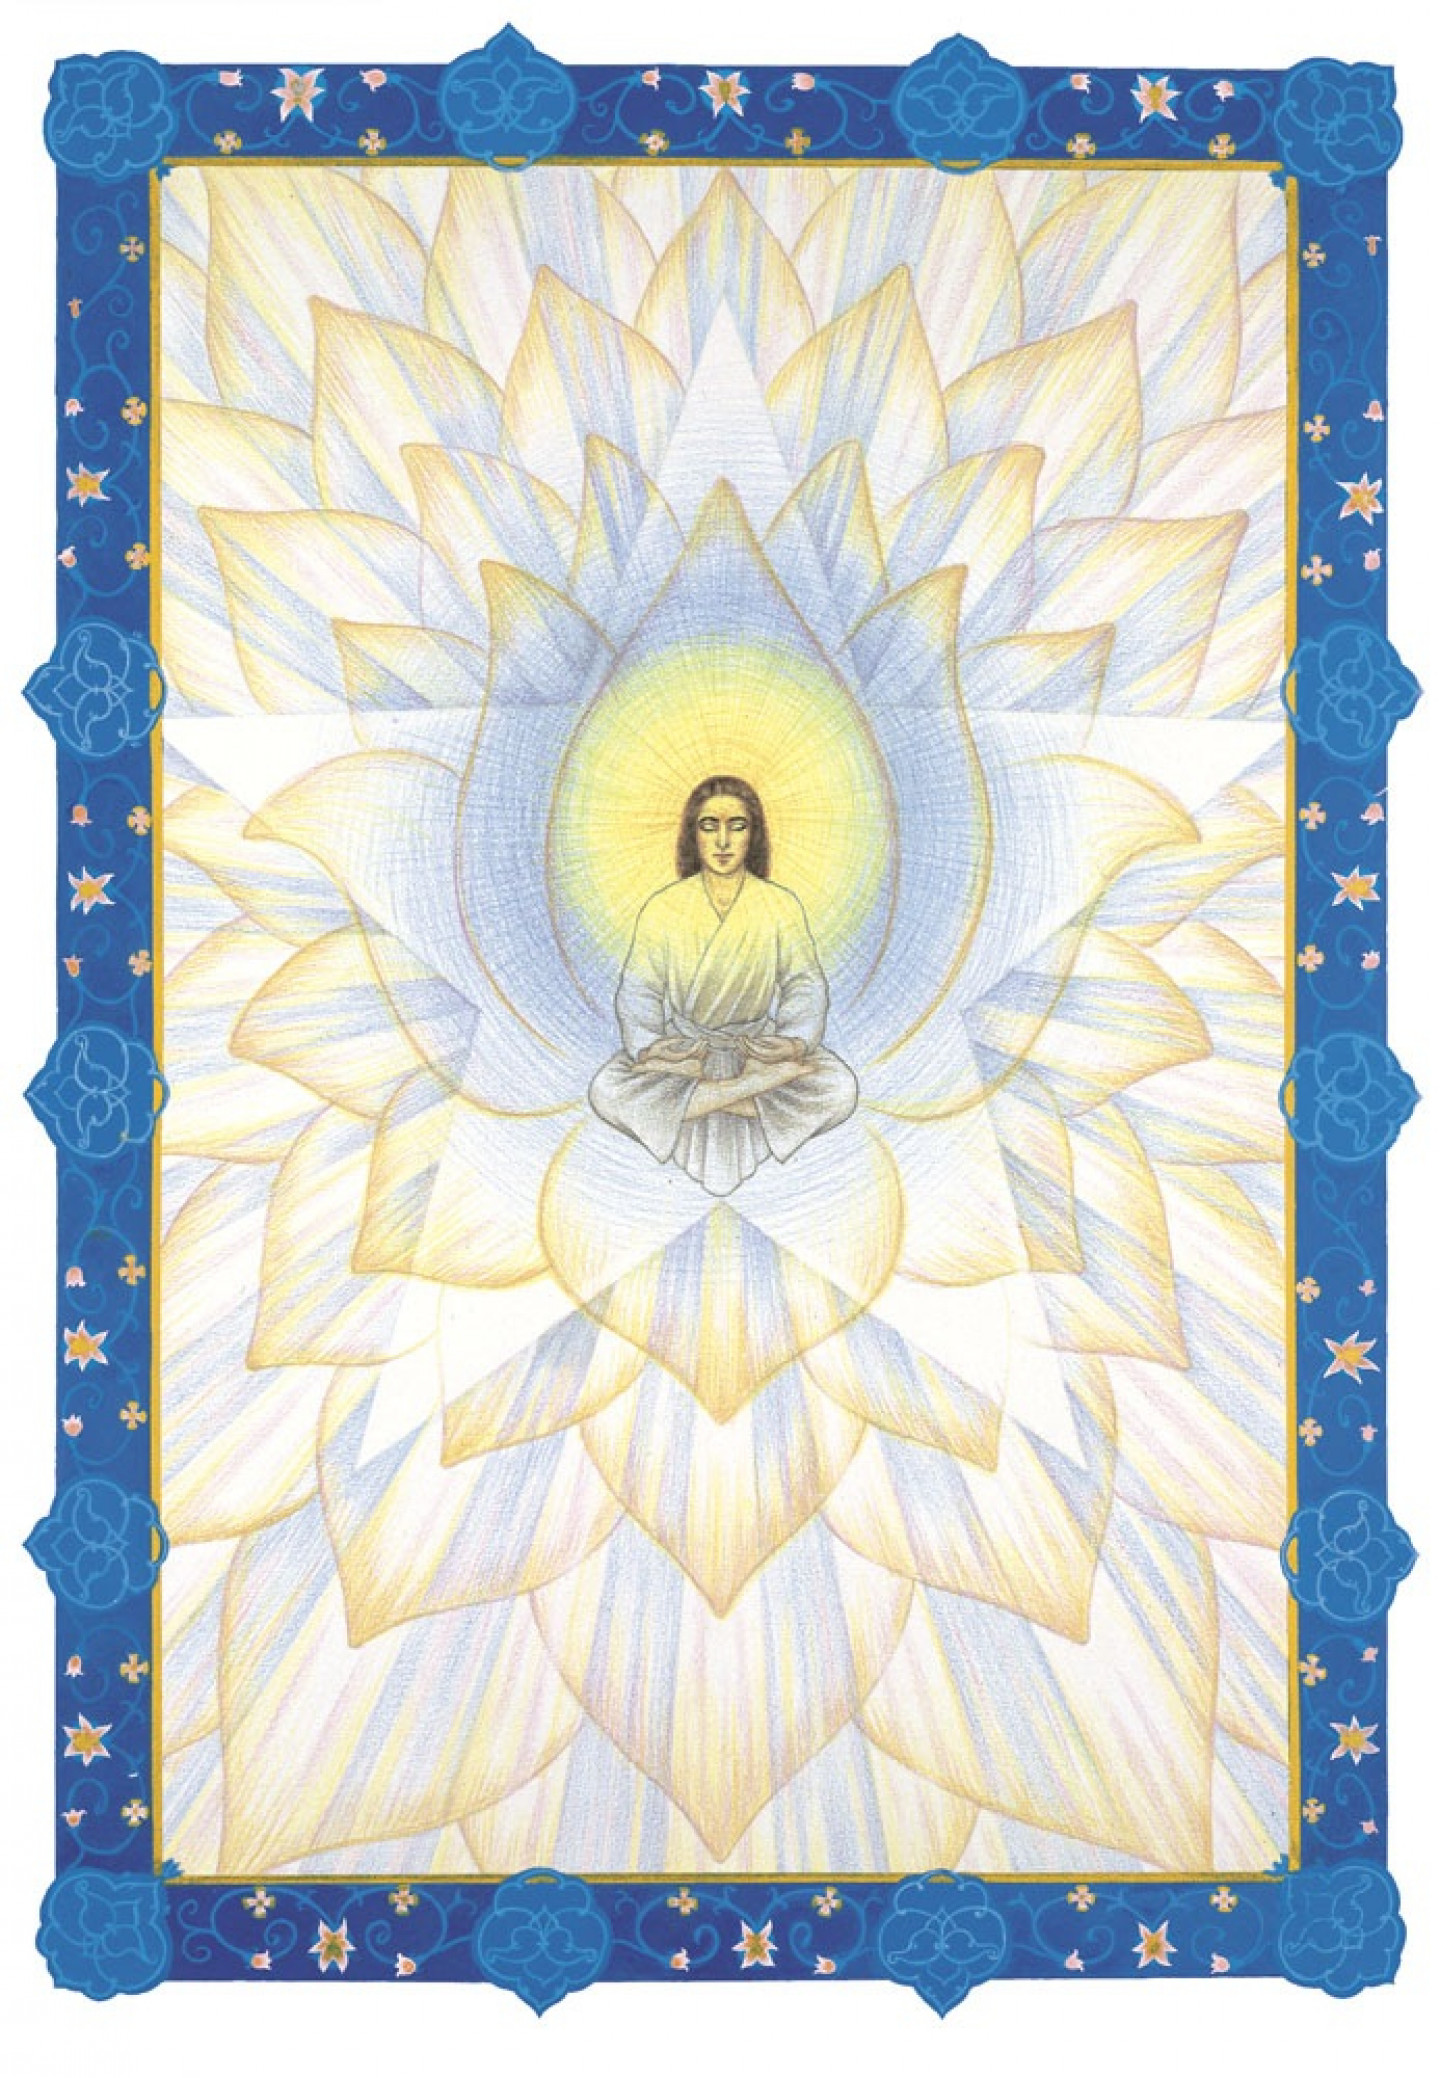 Path Yoga Union With Bliss Through Meditation Technology